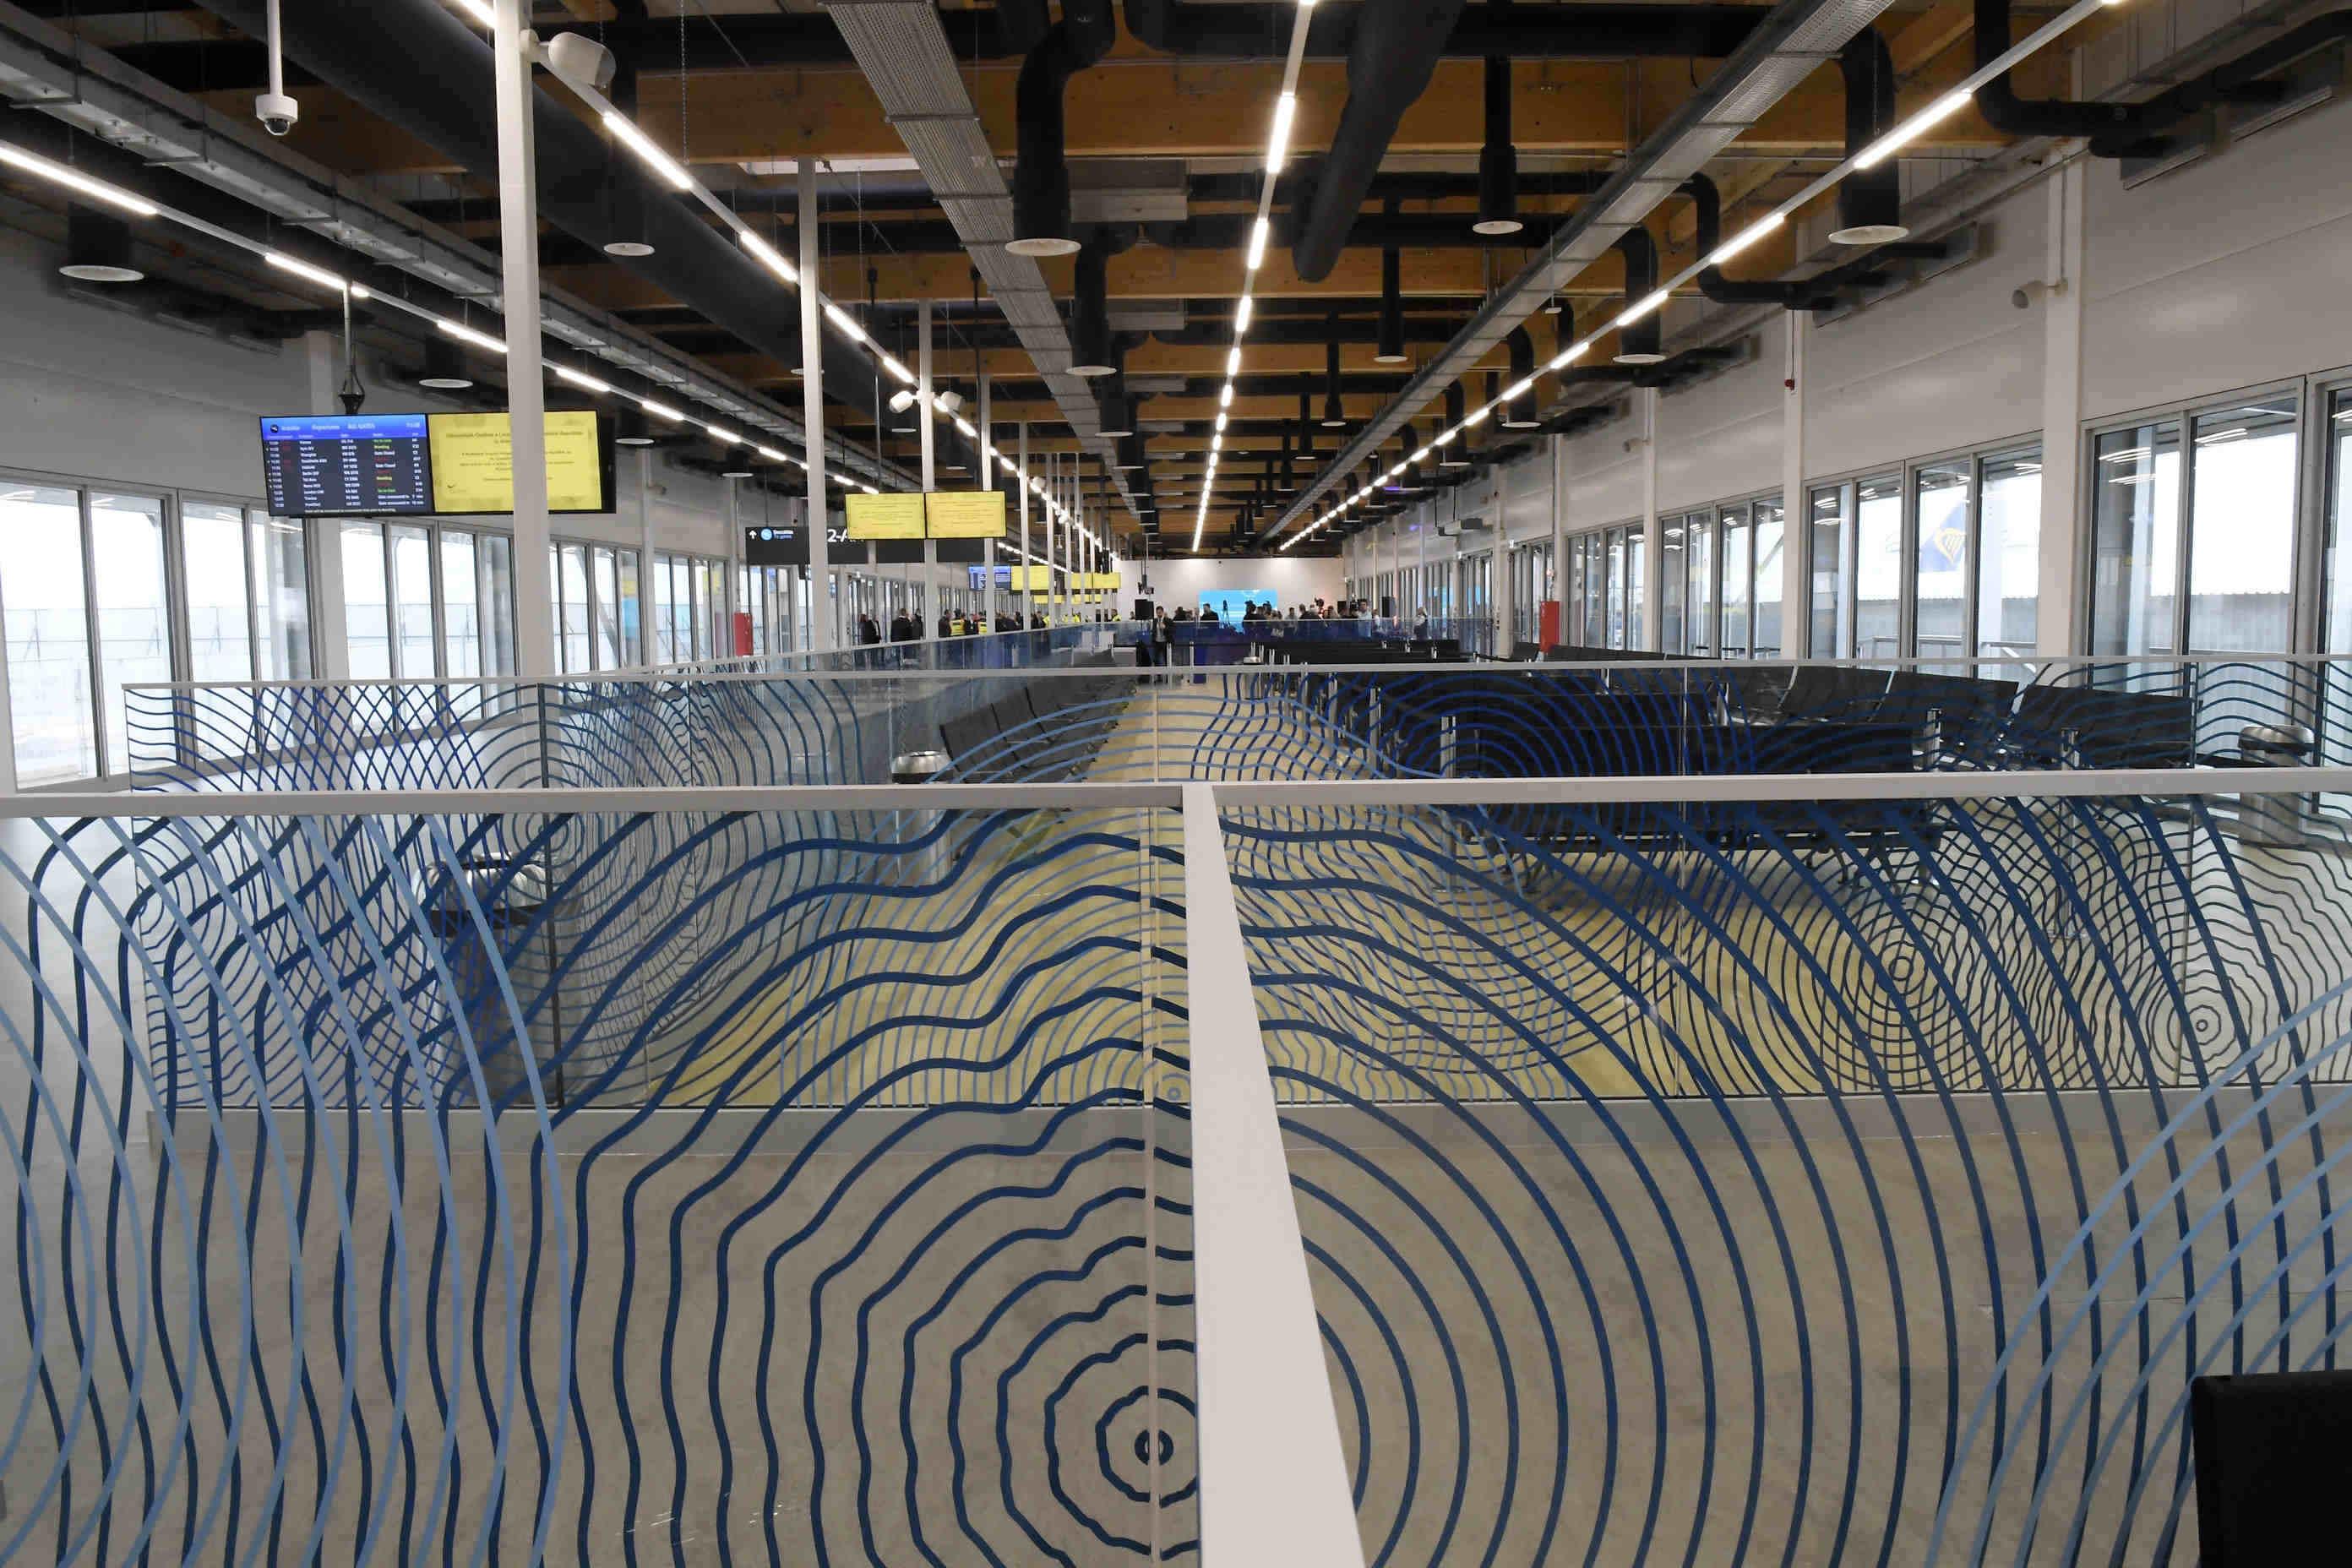 budapest airport passenger pier